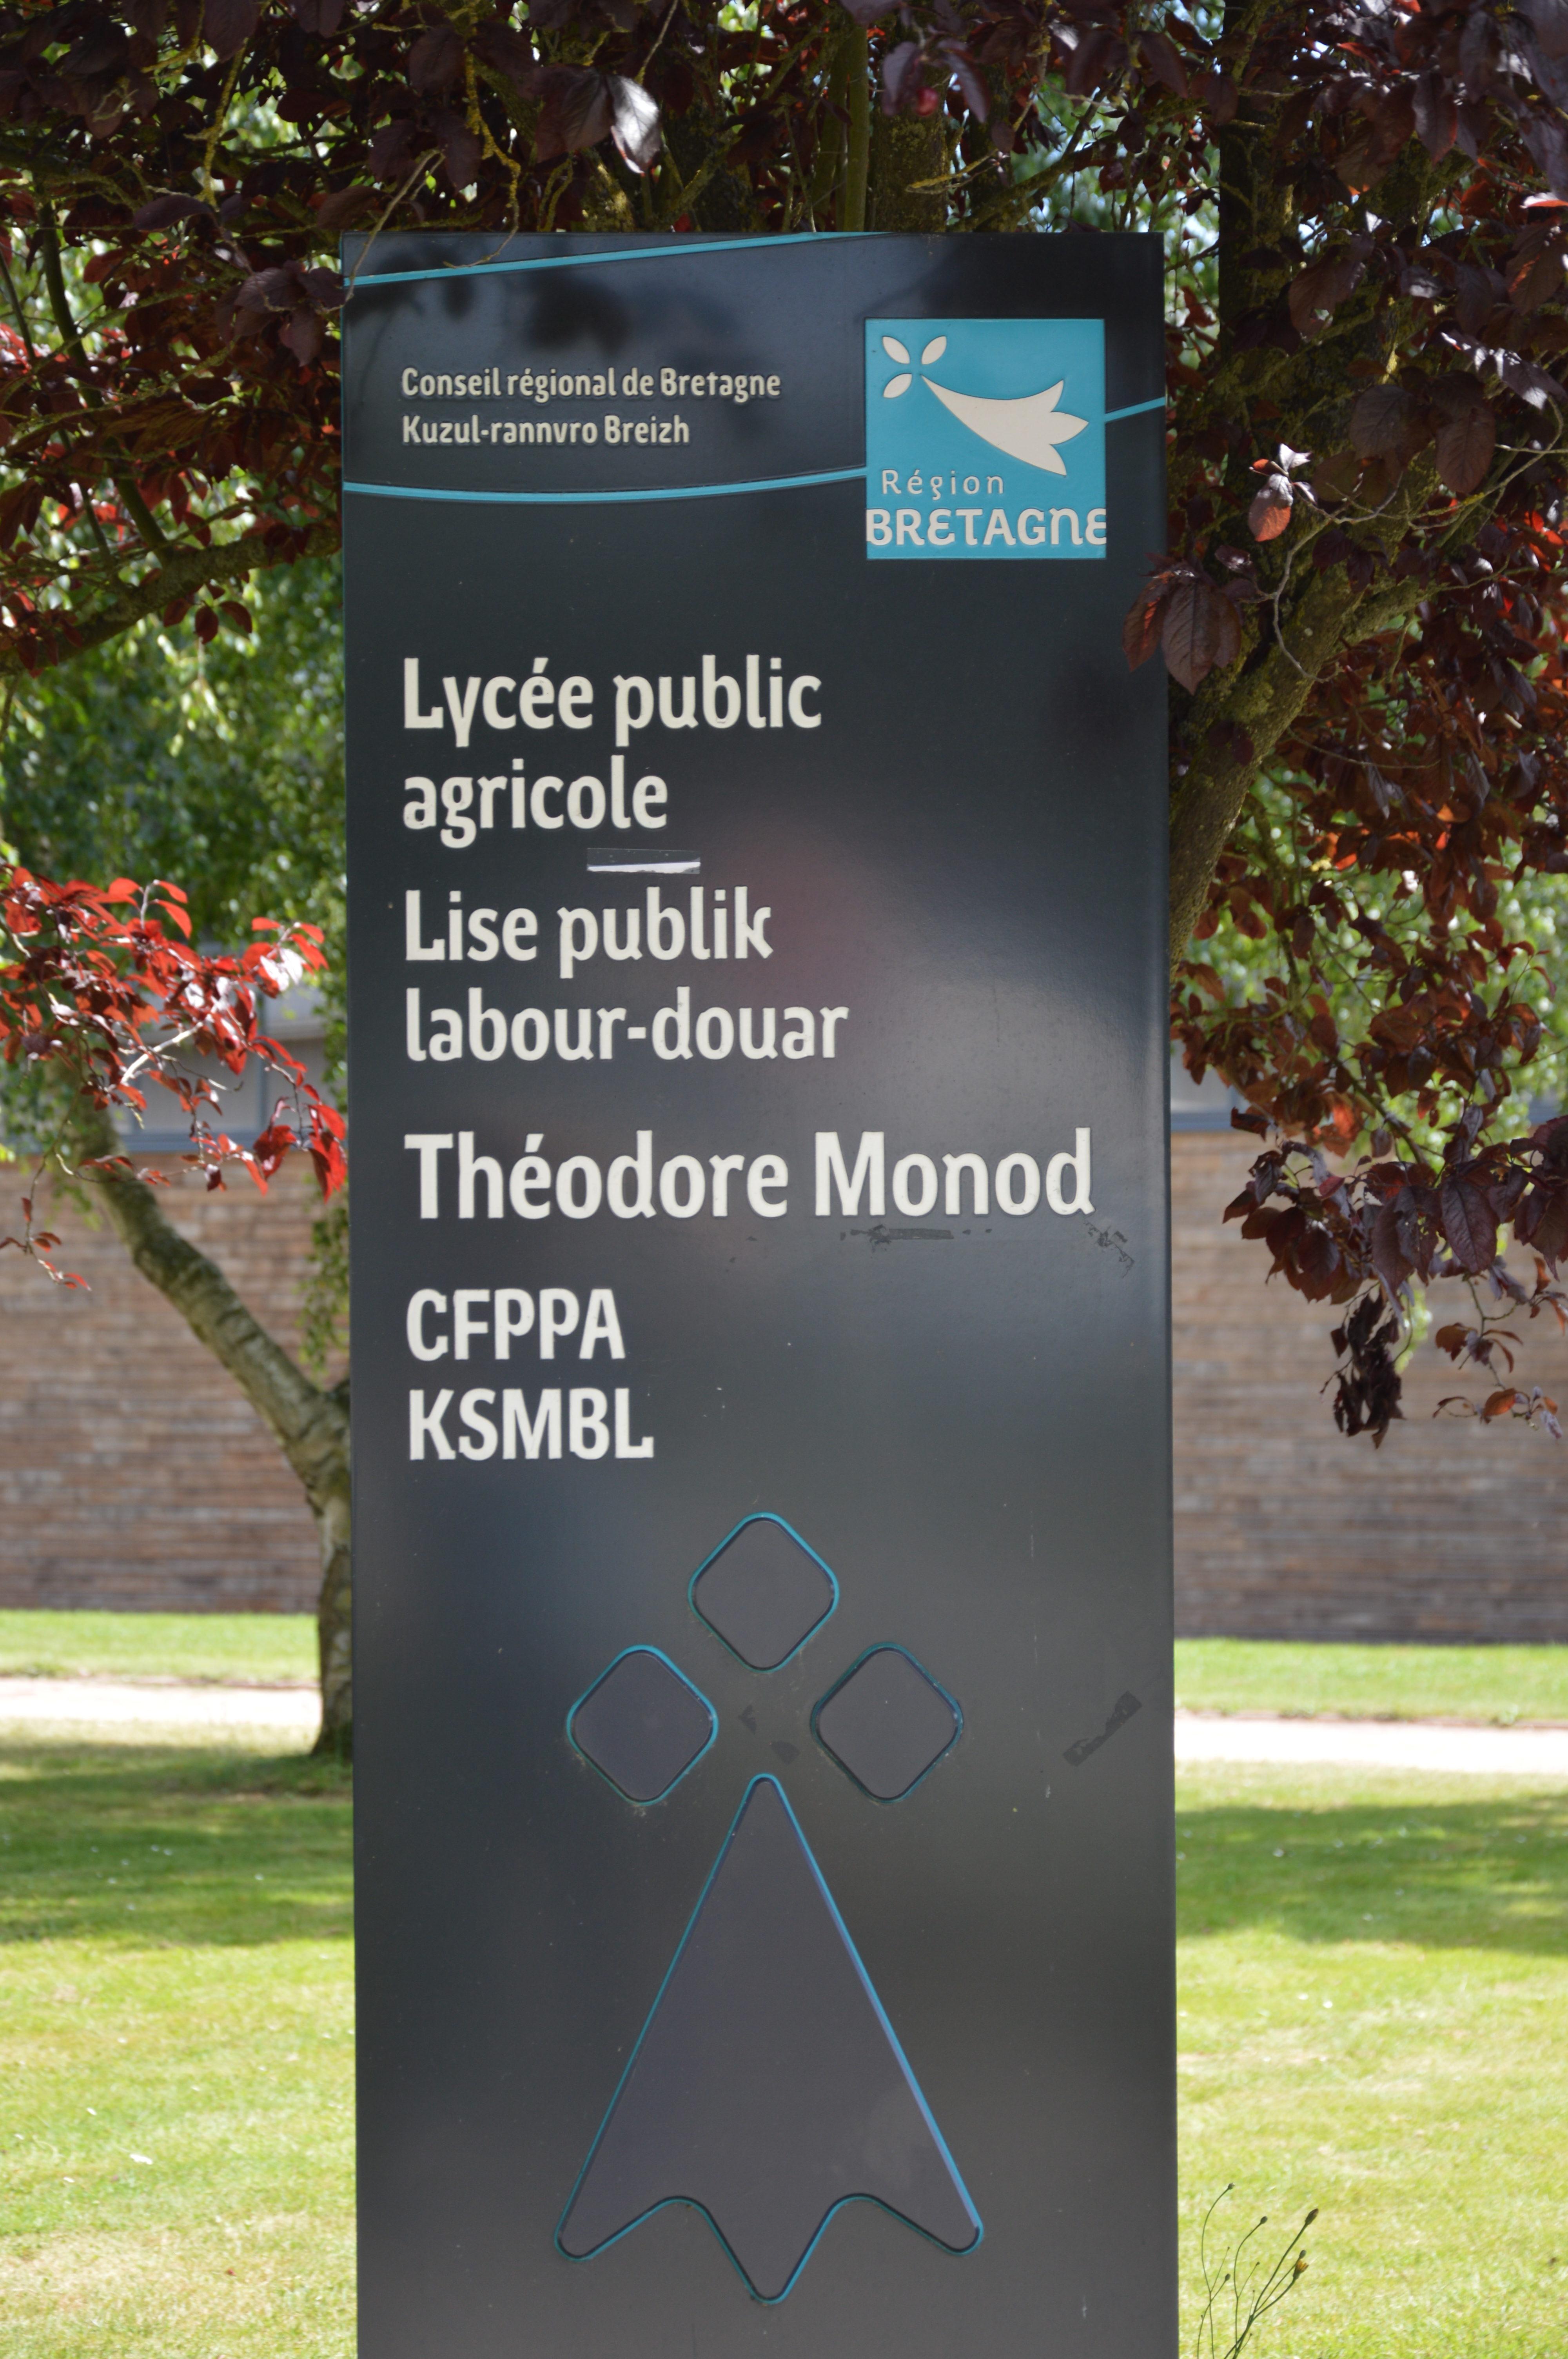 CFPPA Lycée public agricole Théodore Monod